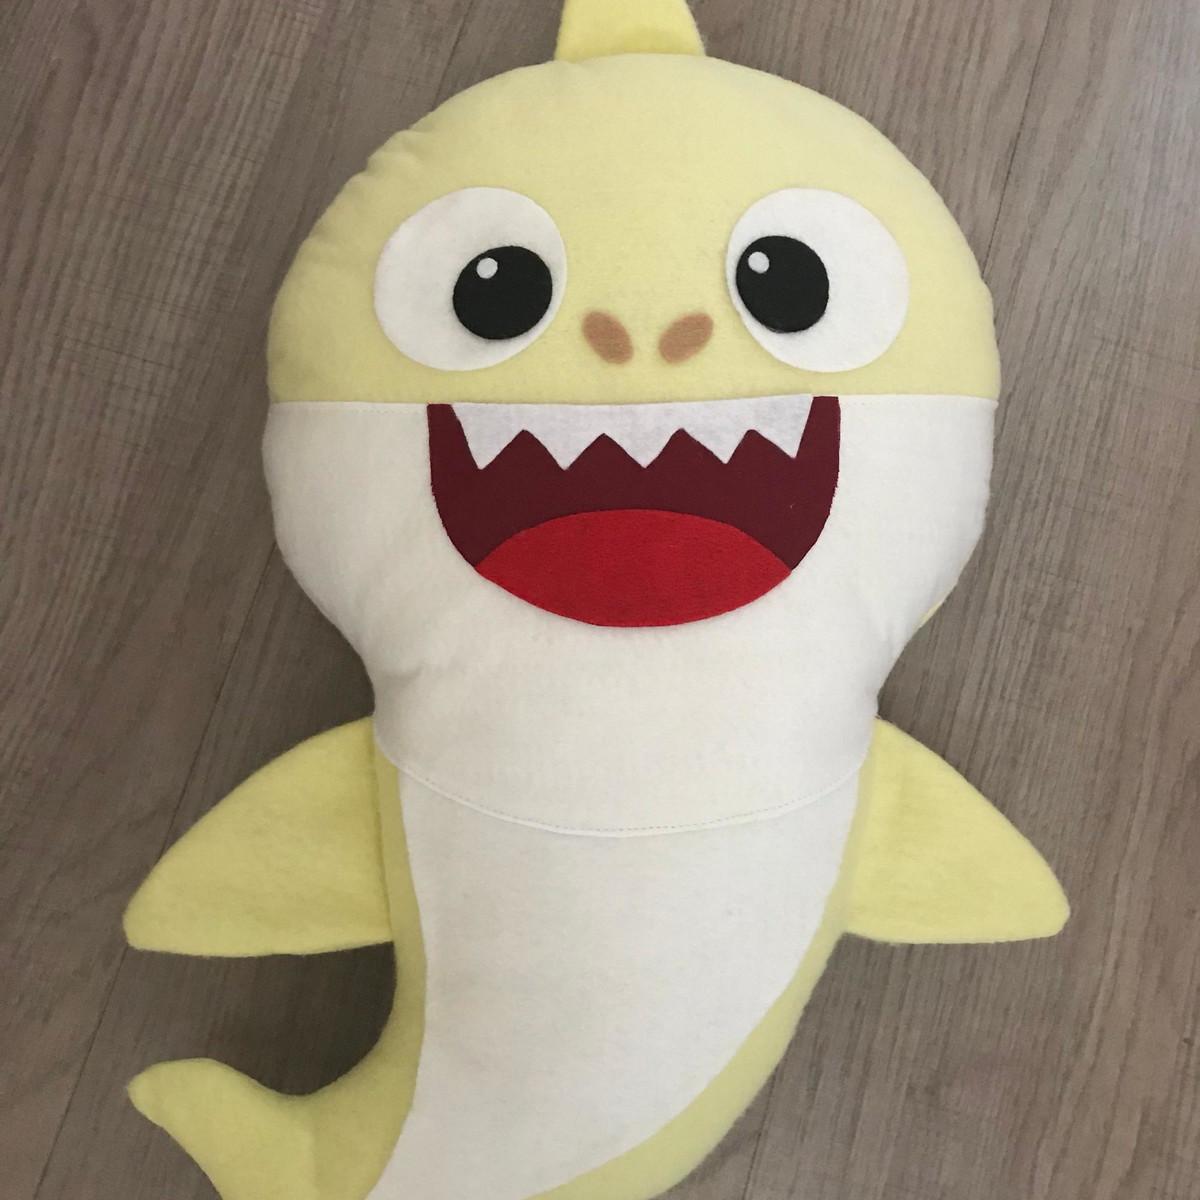 Tubaro baby shark pink fong em feltro no elo7 matsuart lembranas zoom tubaro baby shark pink fong em feltro stopboris Choice Image